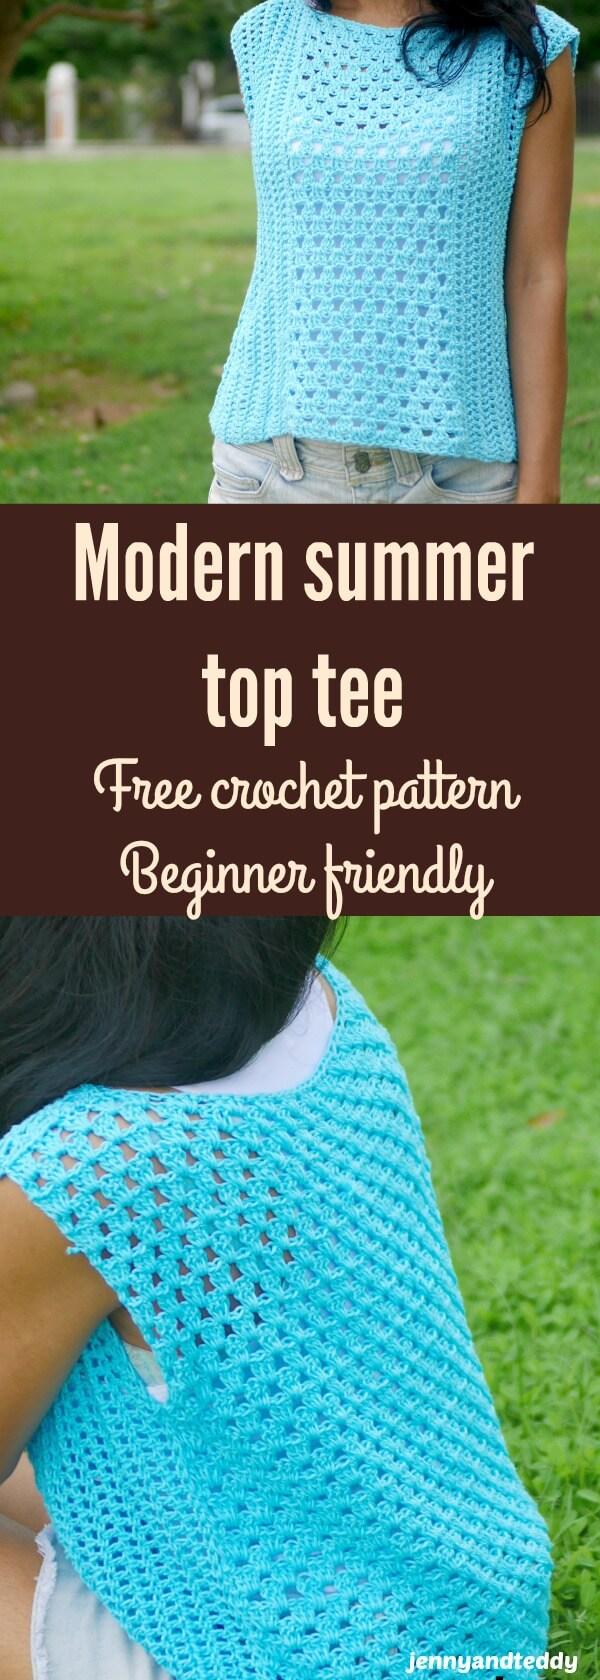 modern cotton summer top tee free crochet pattern beginner friendly by jennyandteddy